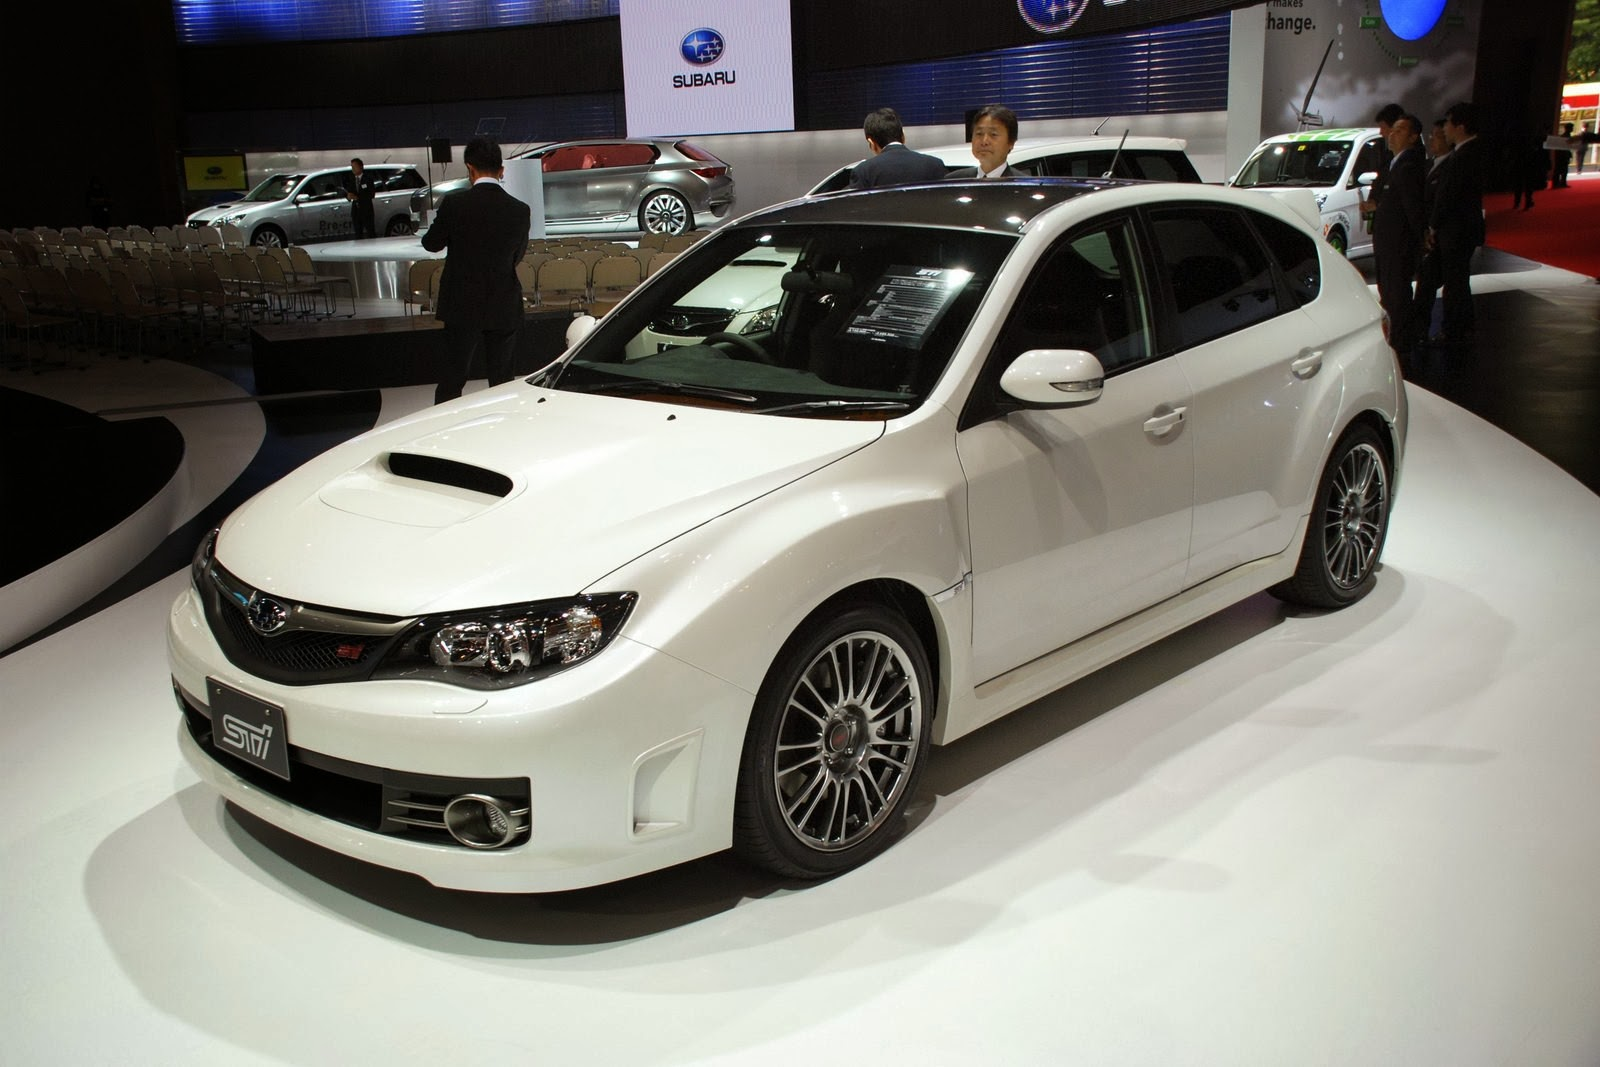 Subaru Impreza Wrx Sti Carbon 2017 Wallpaper